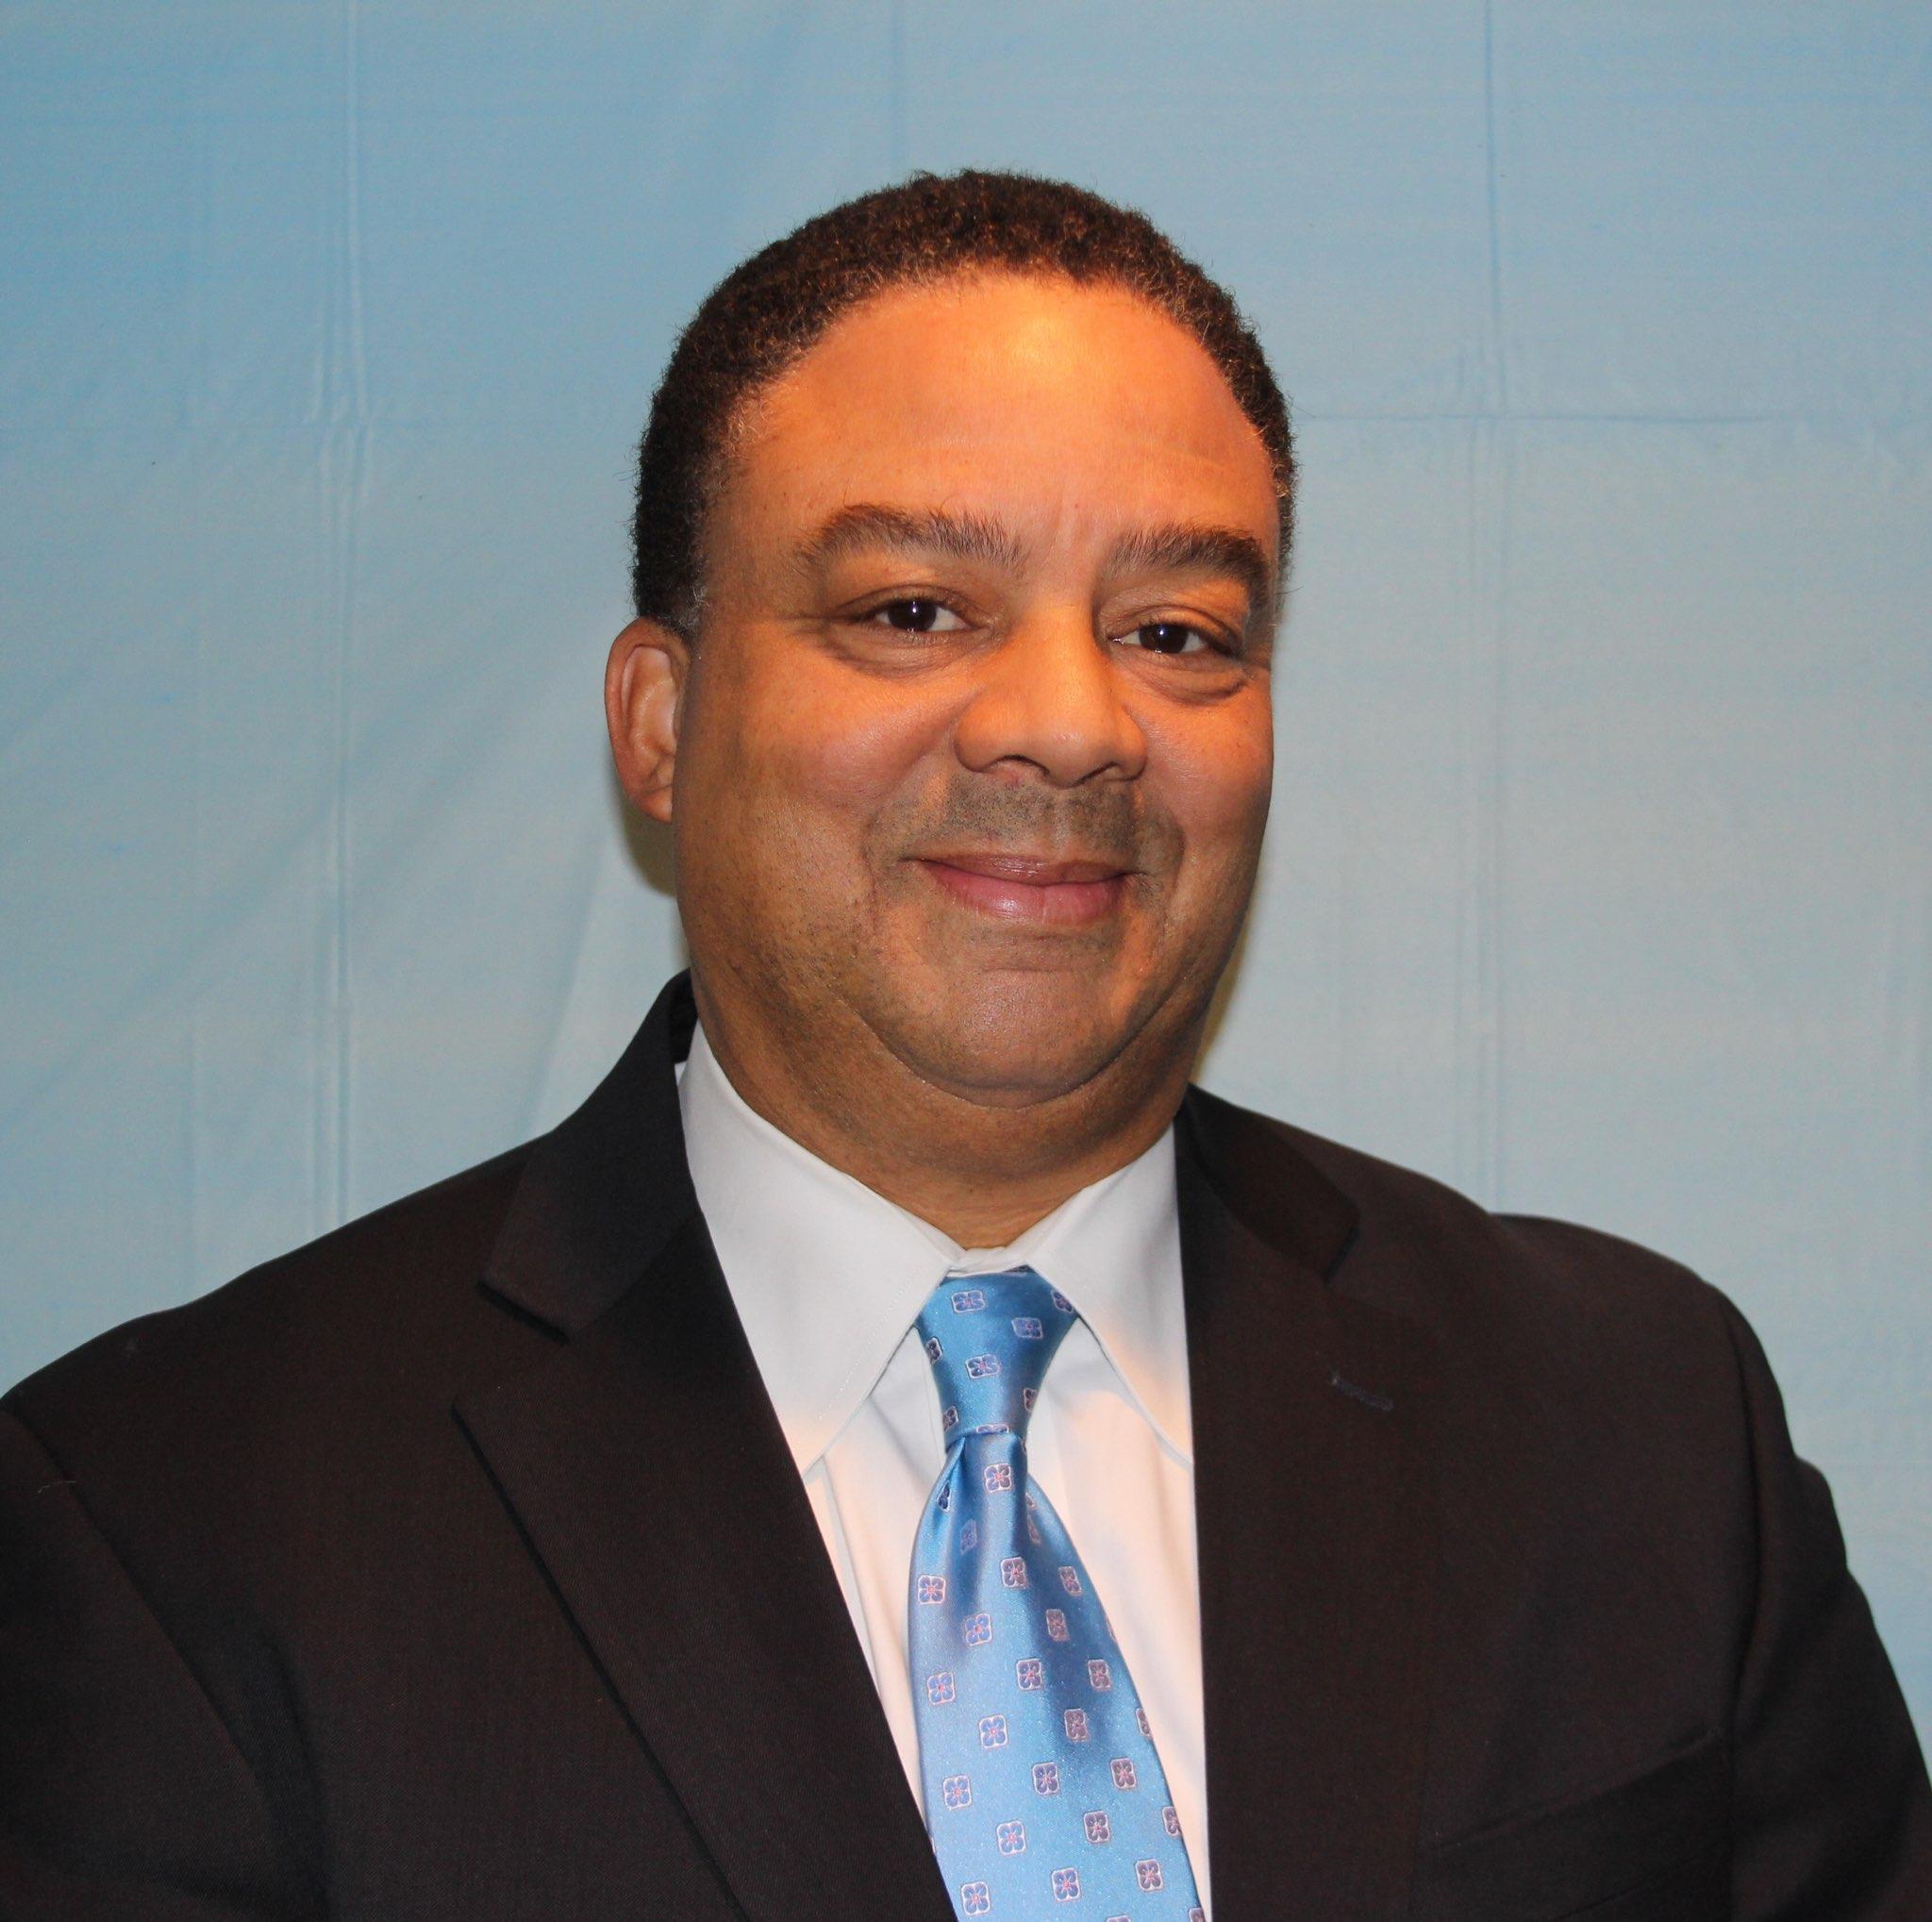 Dr. Brian A. Cole, MD, FAAOS